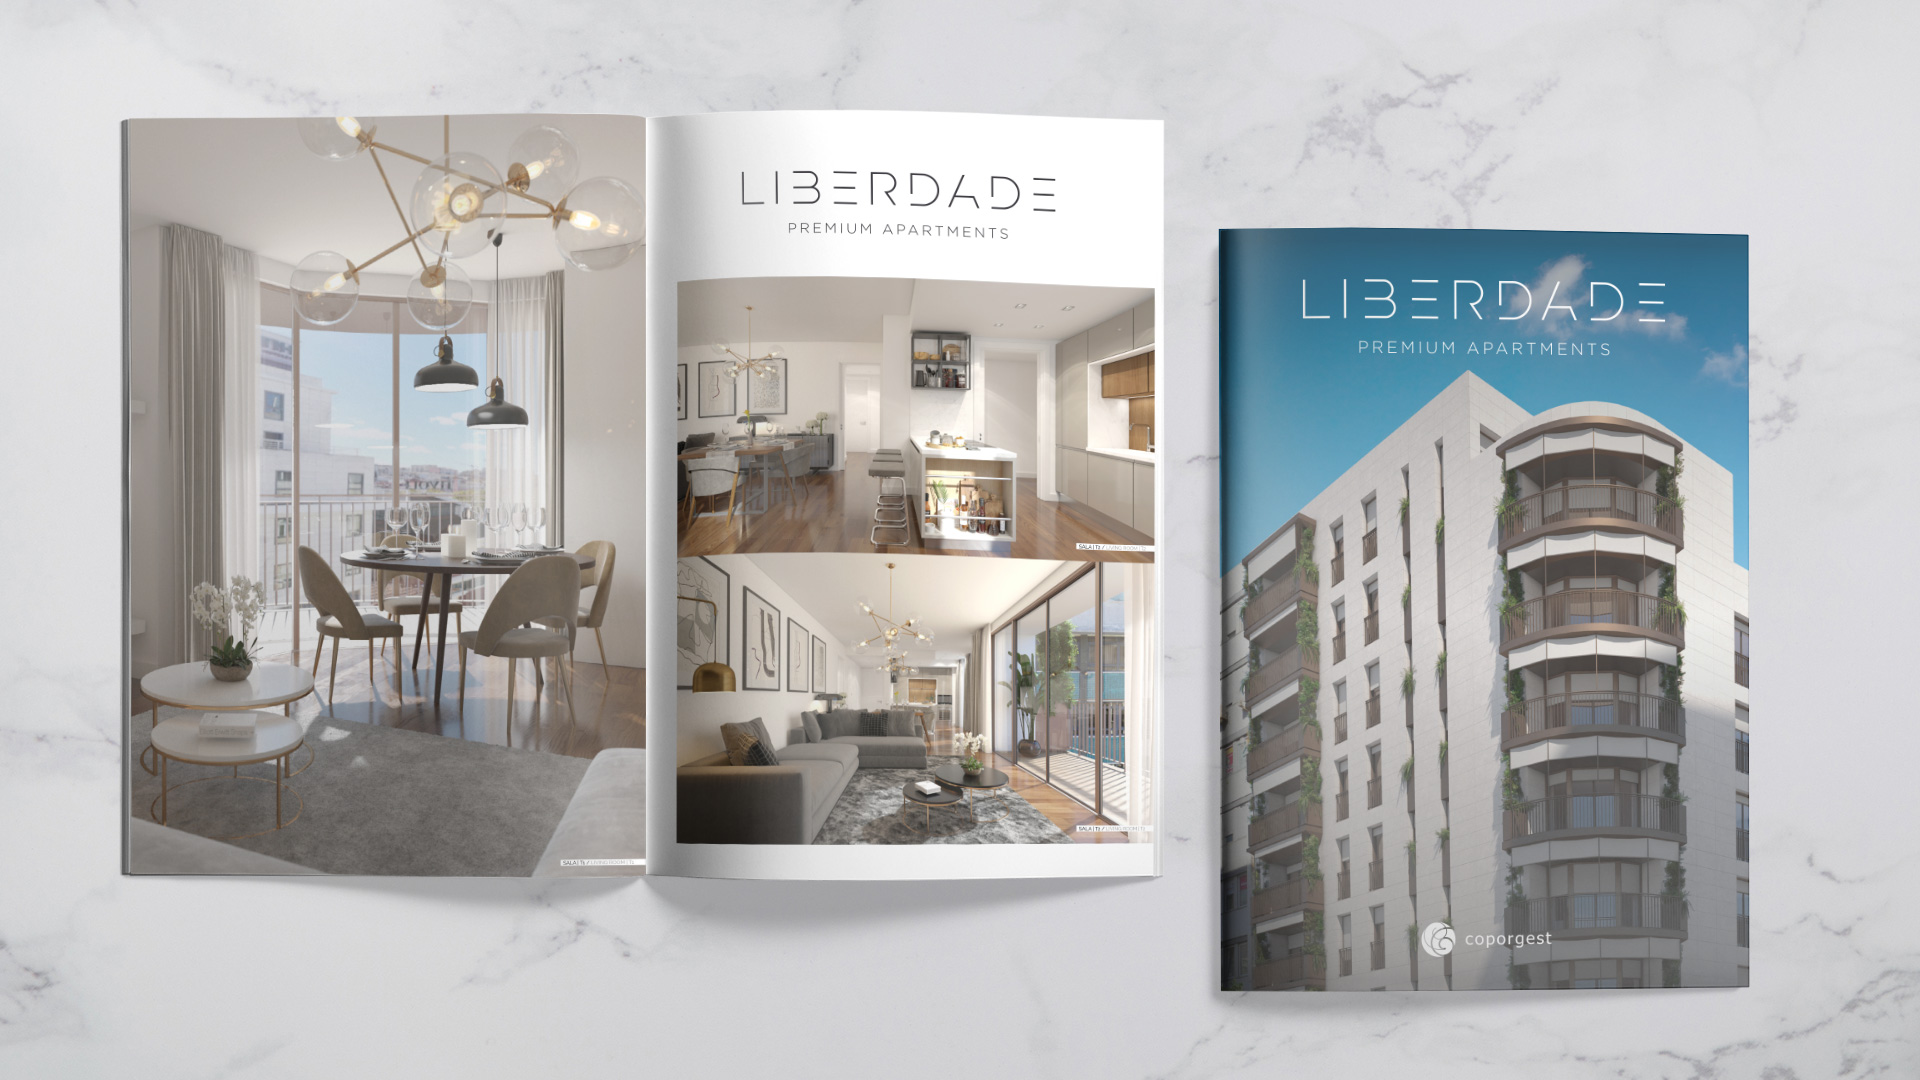 Coporgest - Liberdade Premium Apartments - Brochura